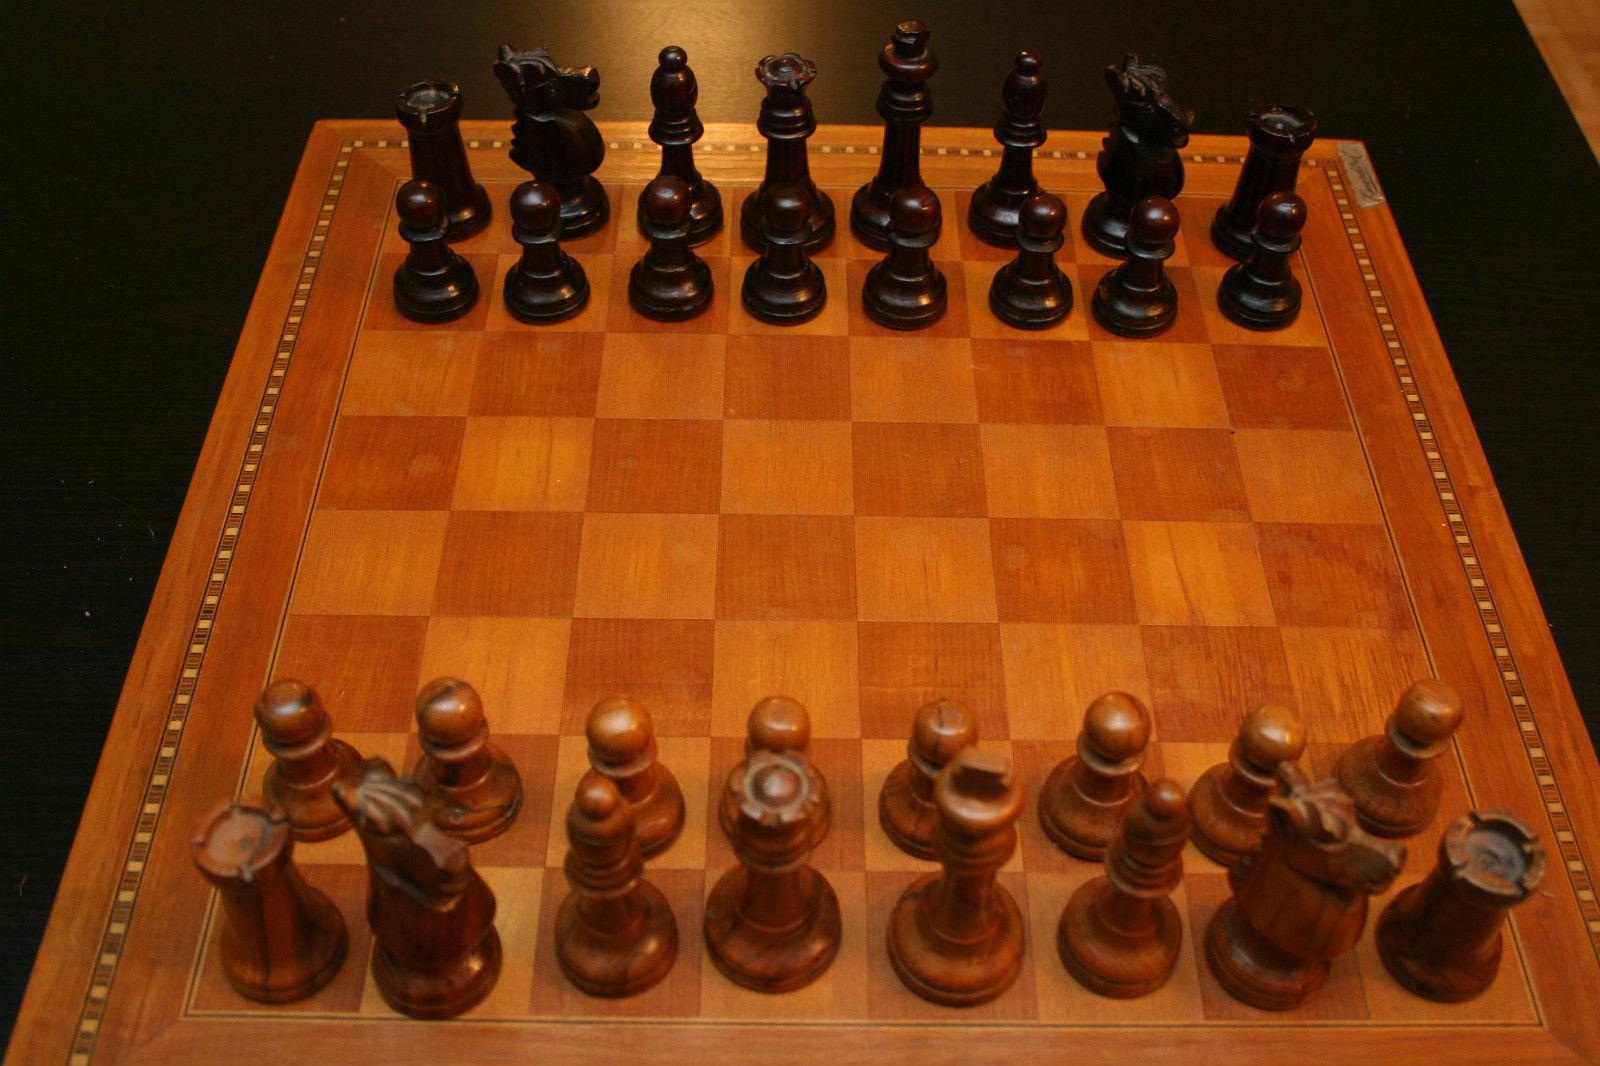 Spanish Chess Sets 4 Escardibul Chess Forums Chess Com